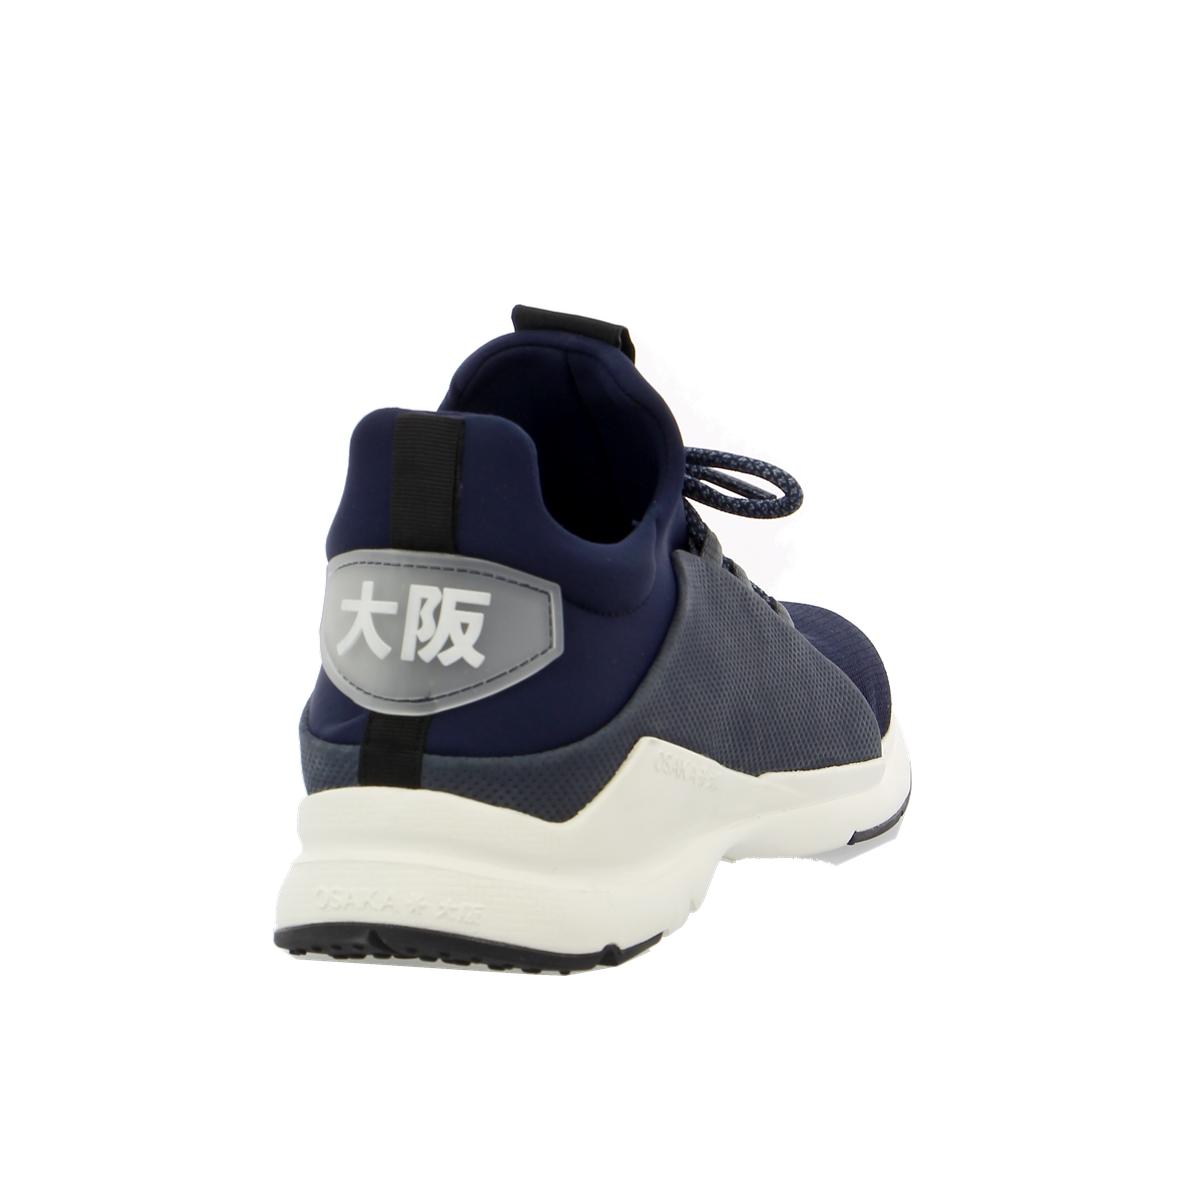 Osaka Basket bleu